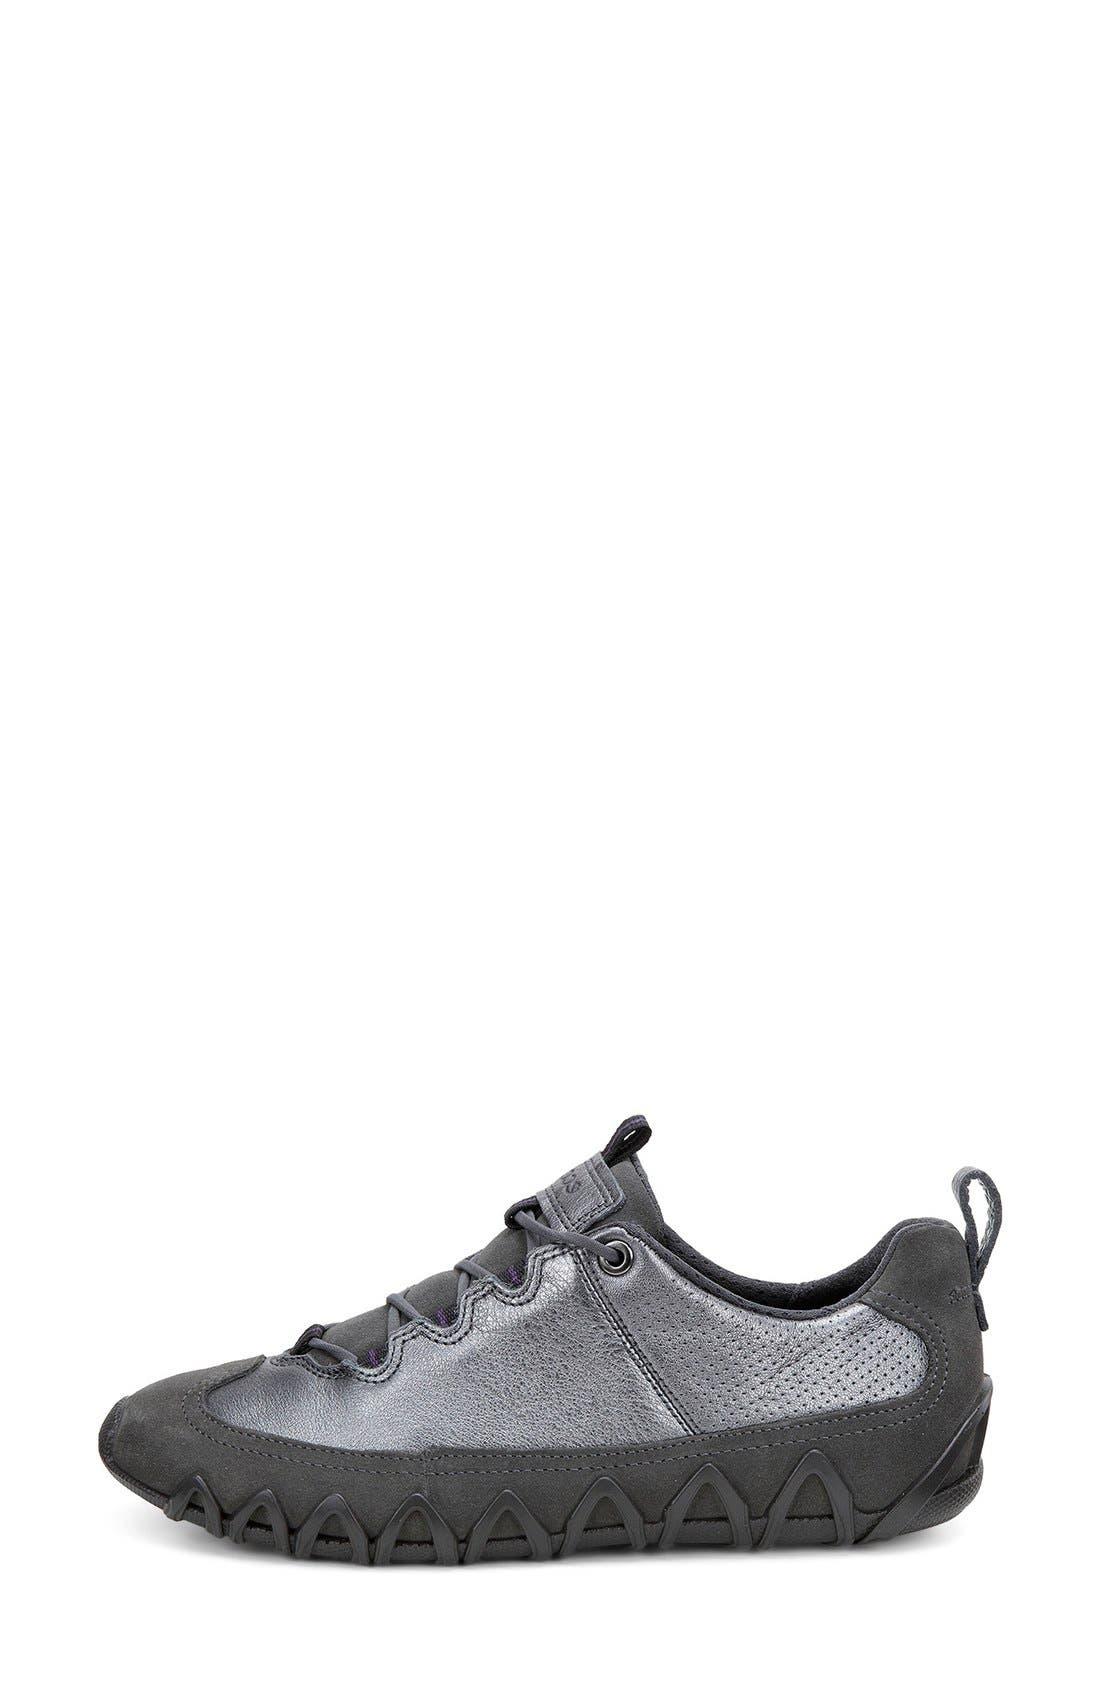 'Dayla' Toggle Sneaker,                             Alternate thumbnail 4, color,                             040